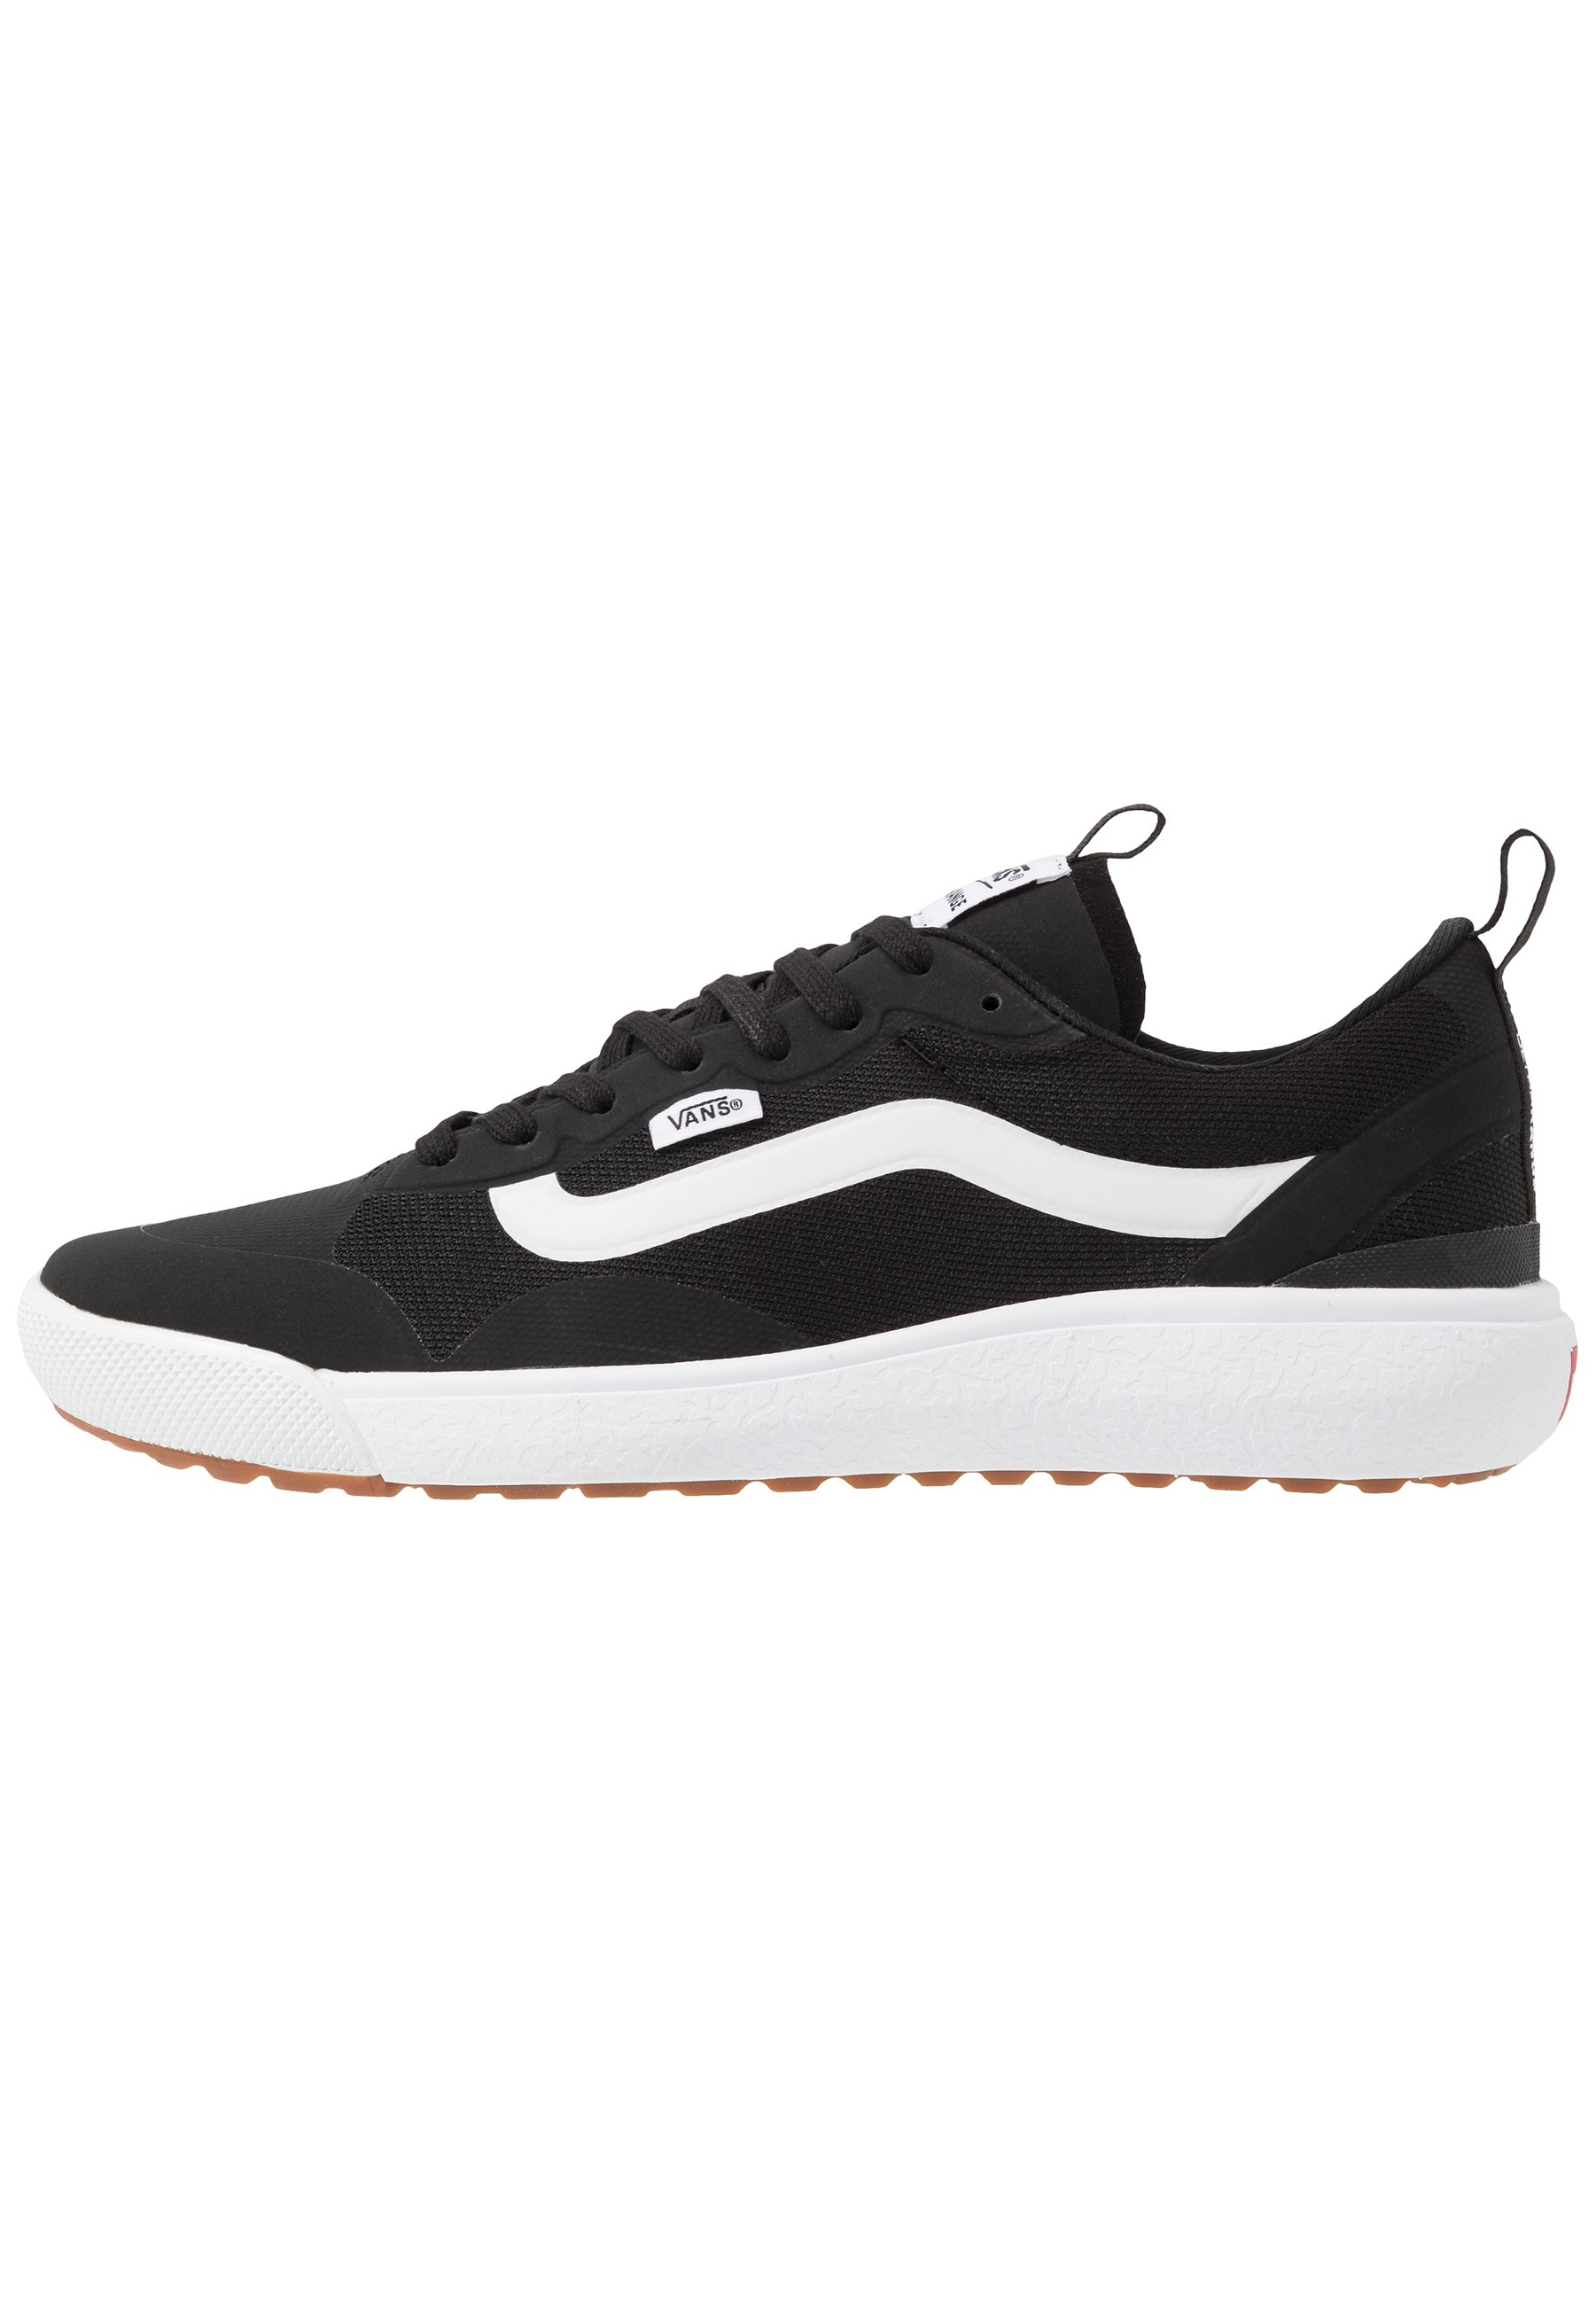 Vans Ultrarange Exo - Sneakers Black